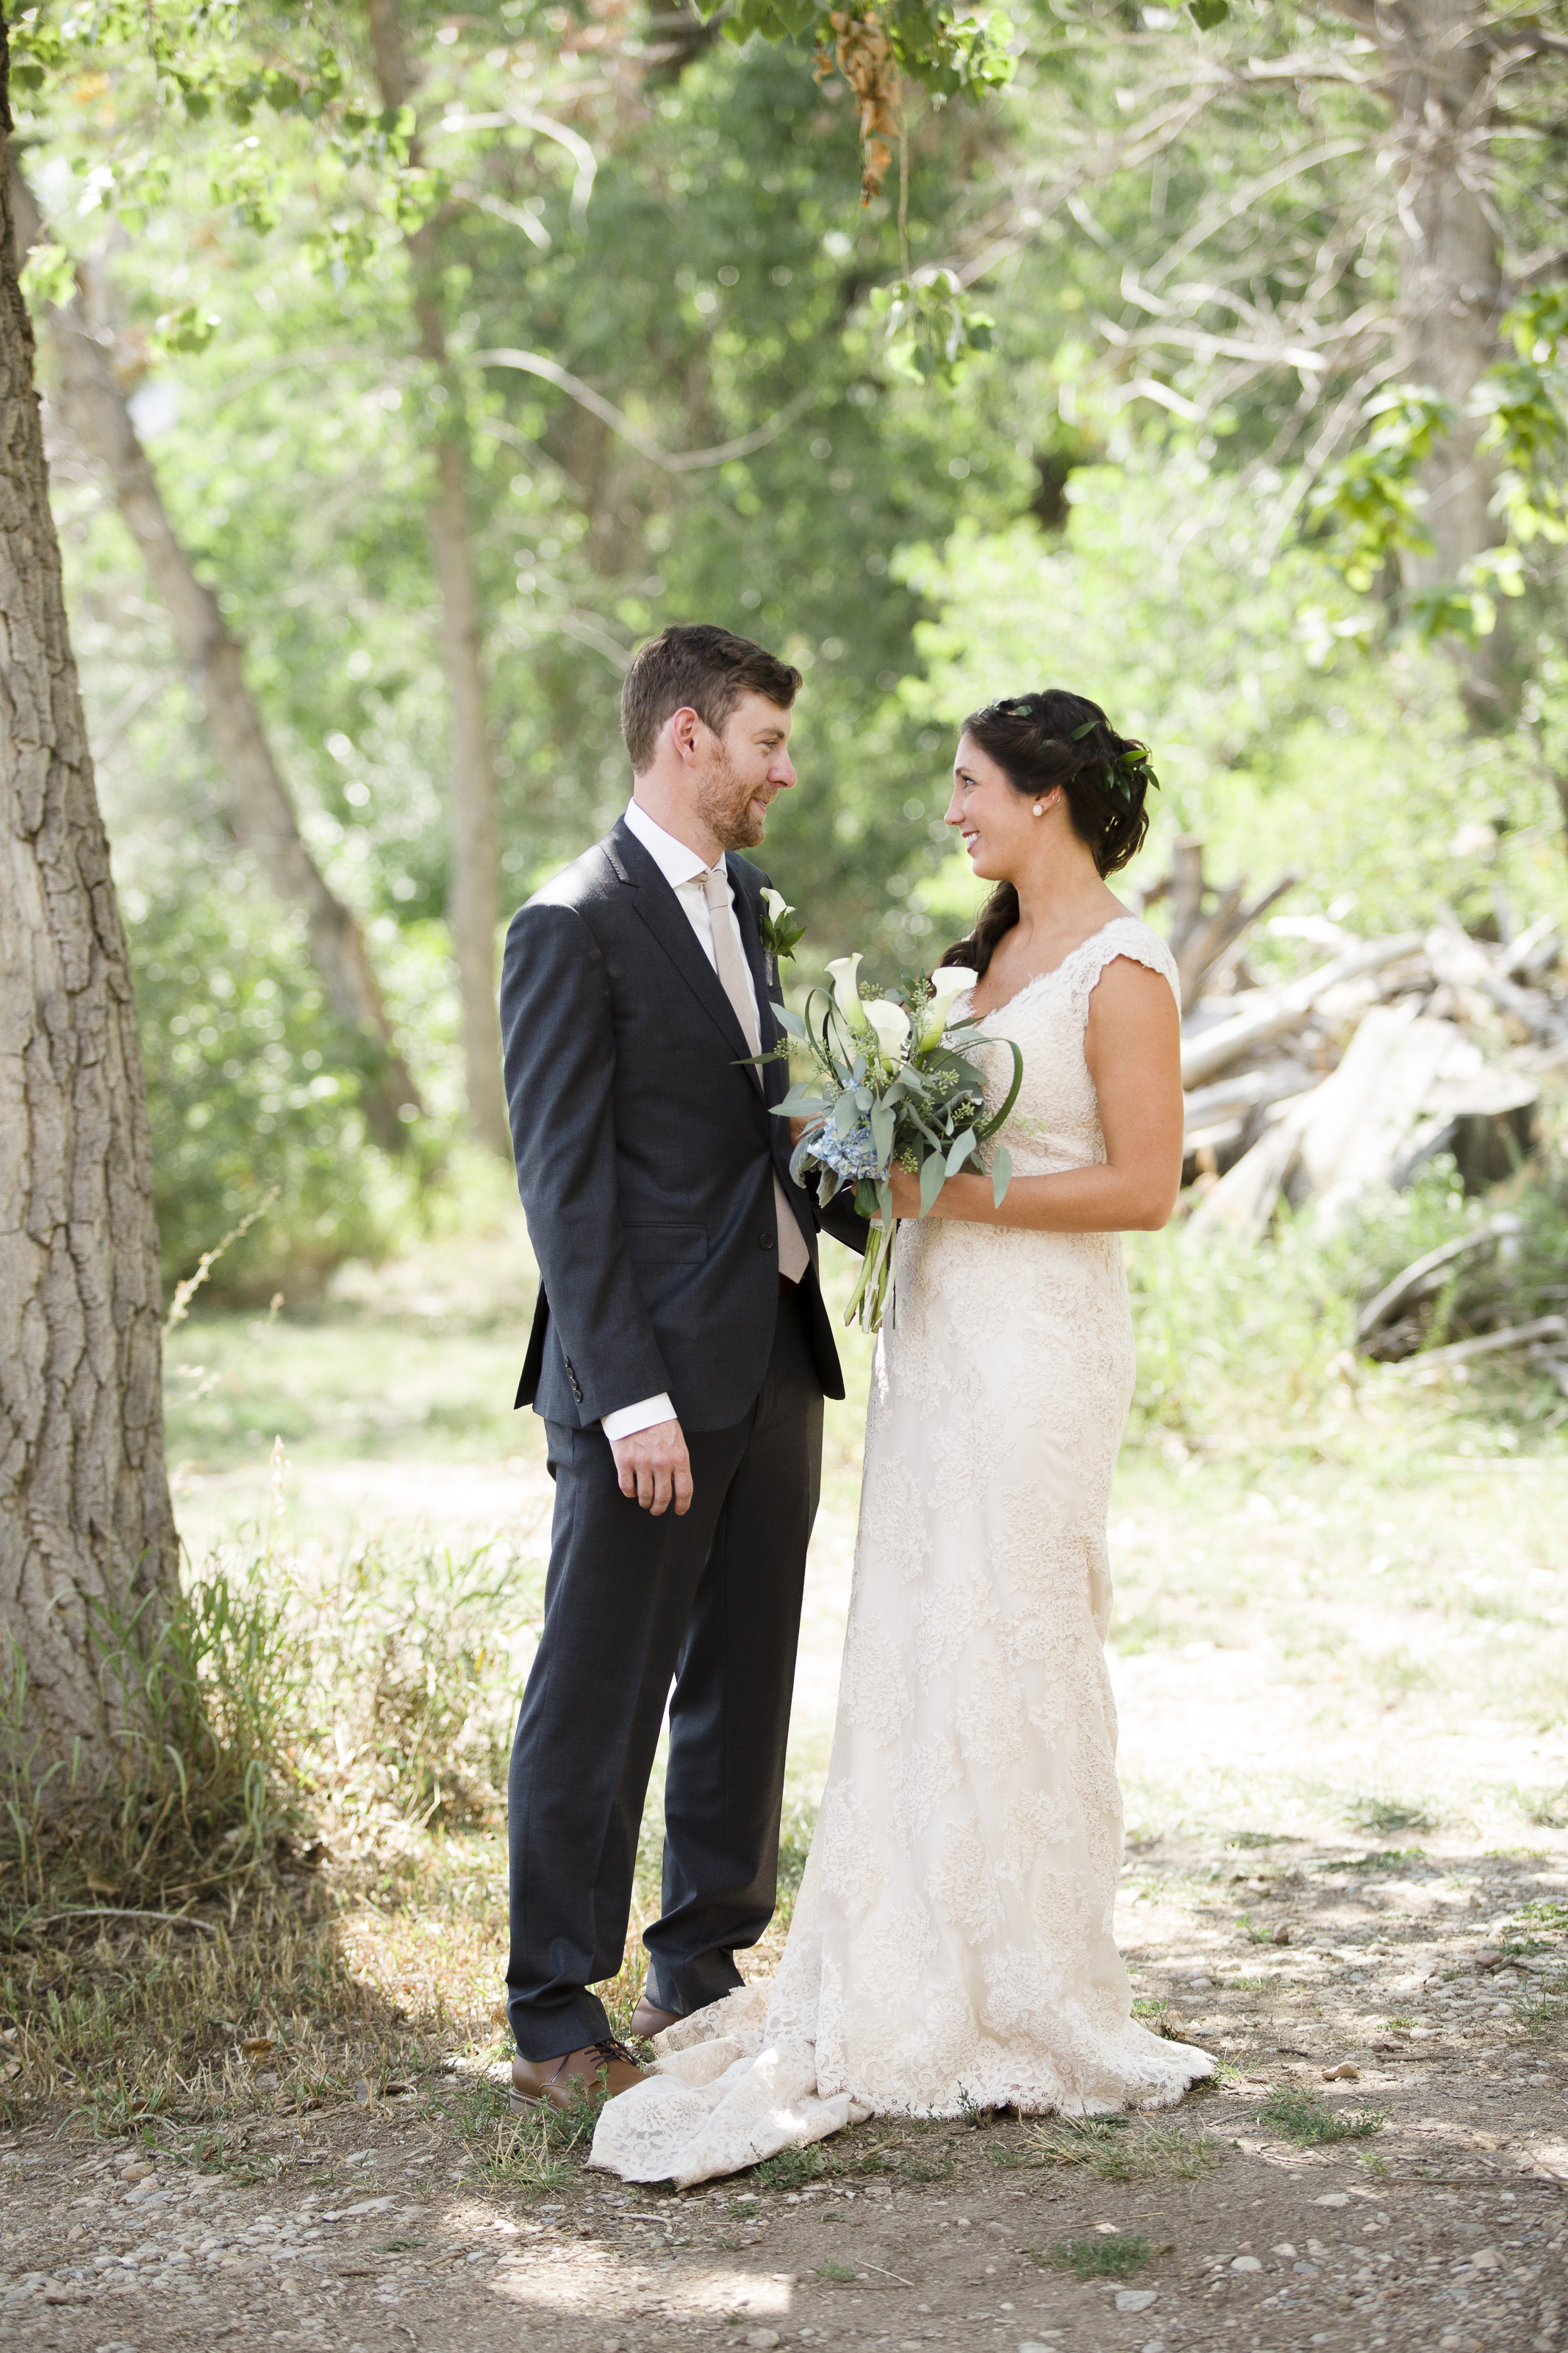 kristen-vance-lonehawk-farm-longmont-colorado-wedding-2017.jpg